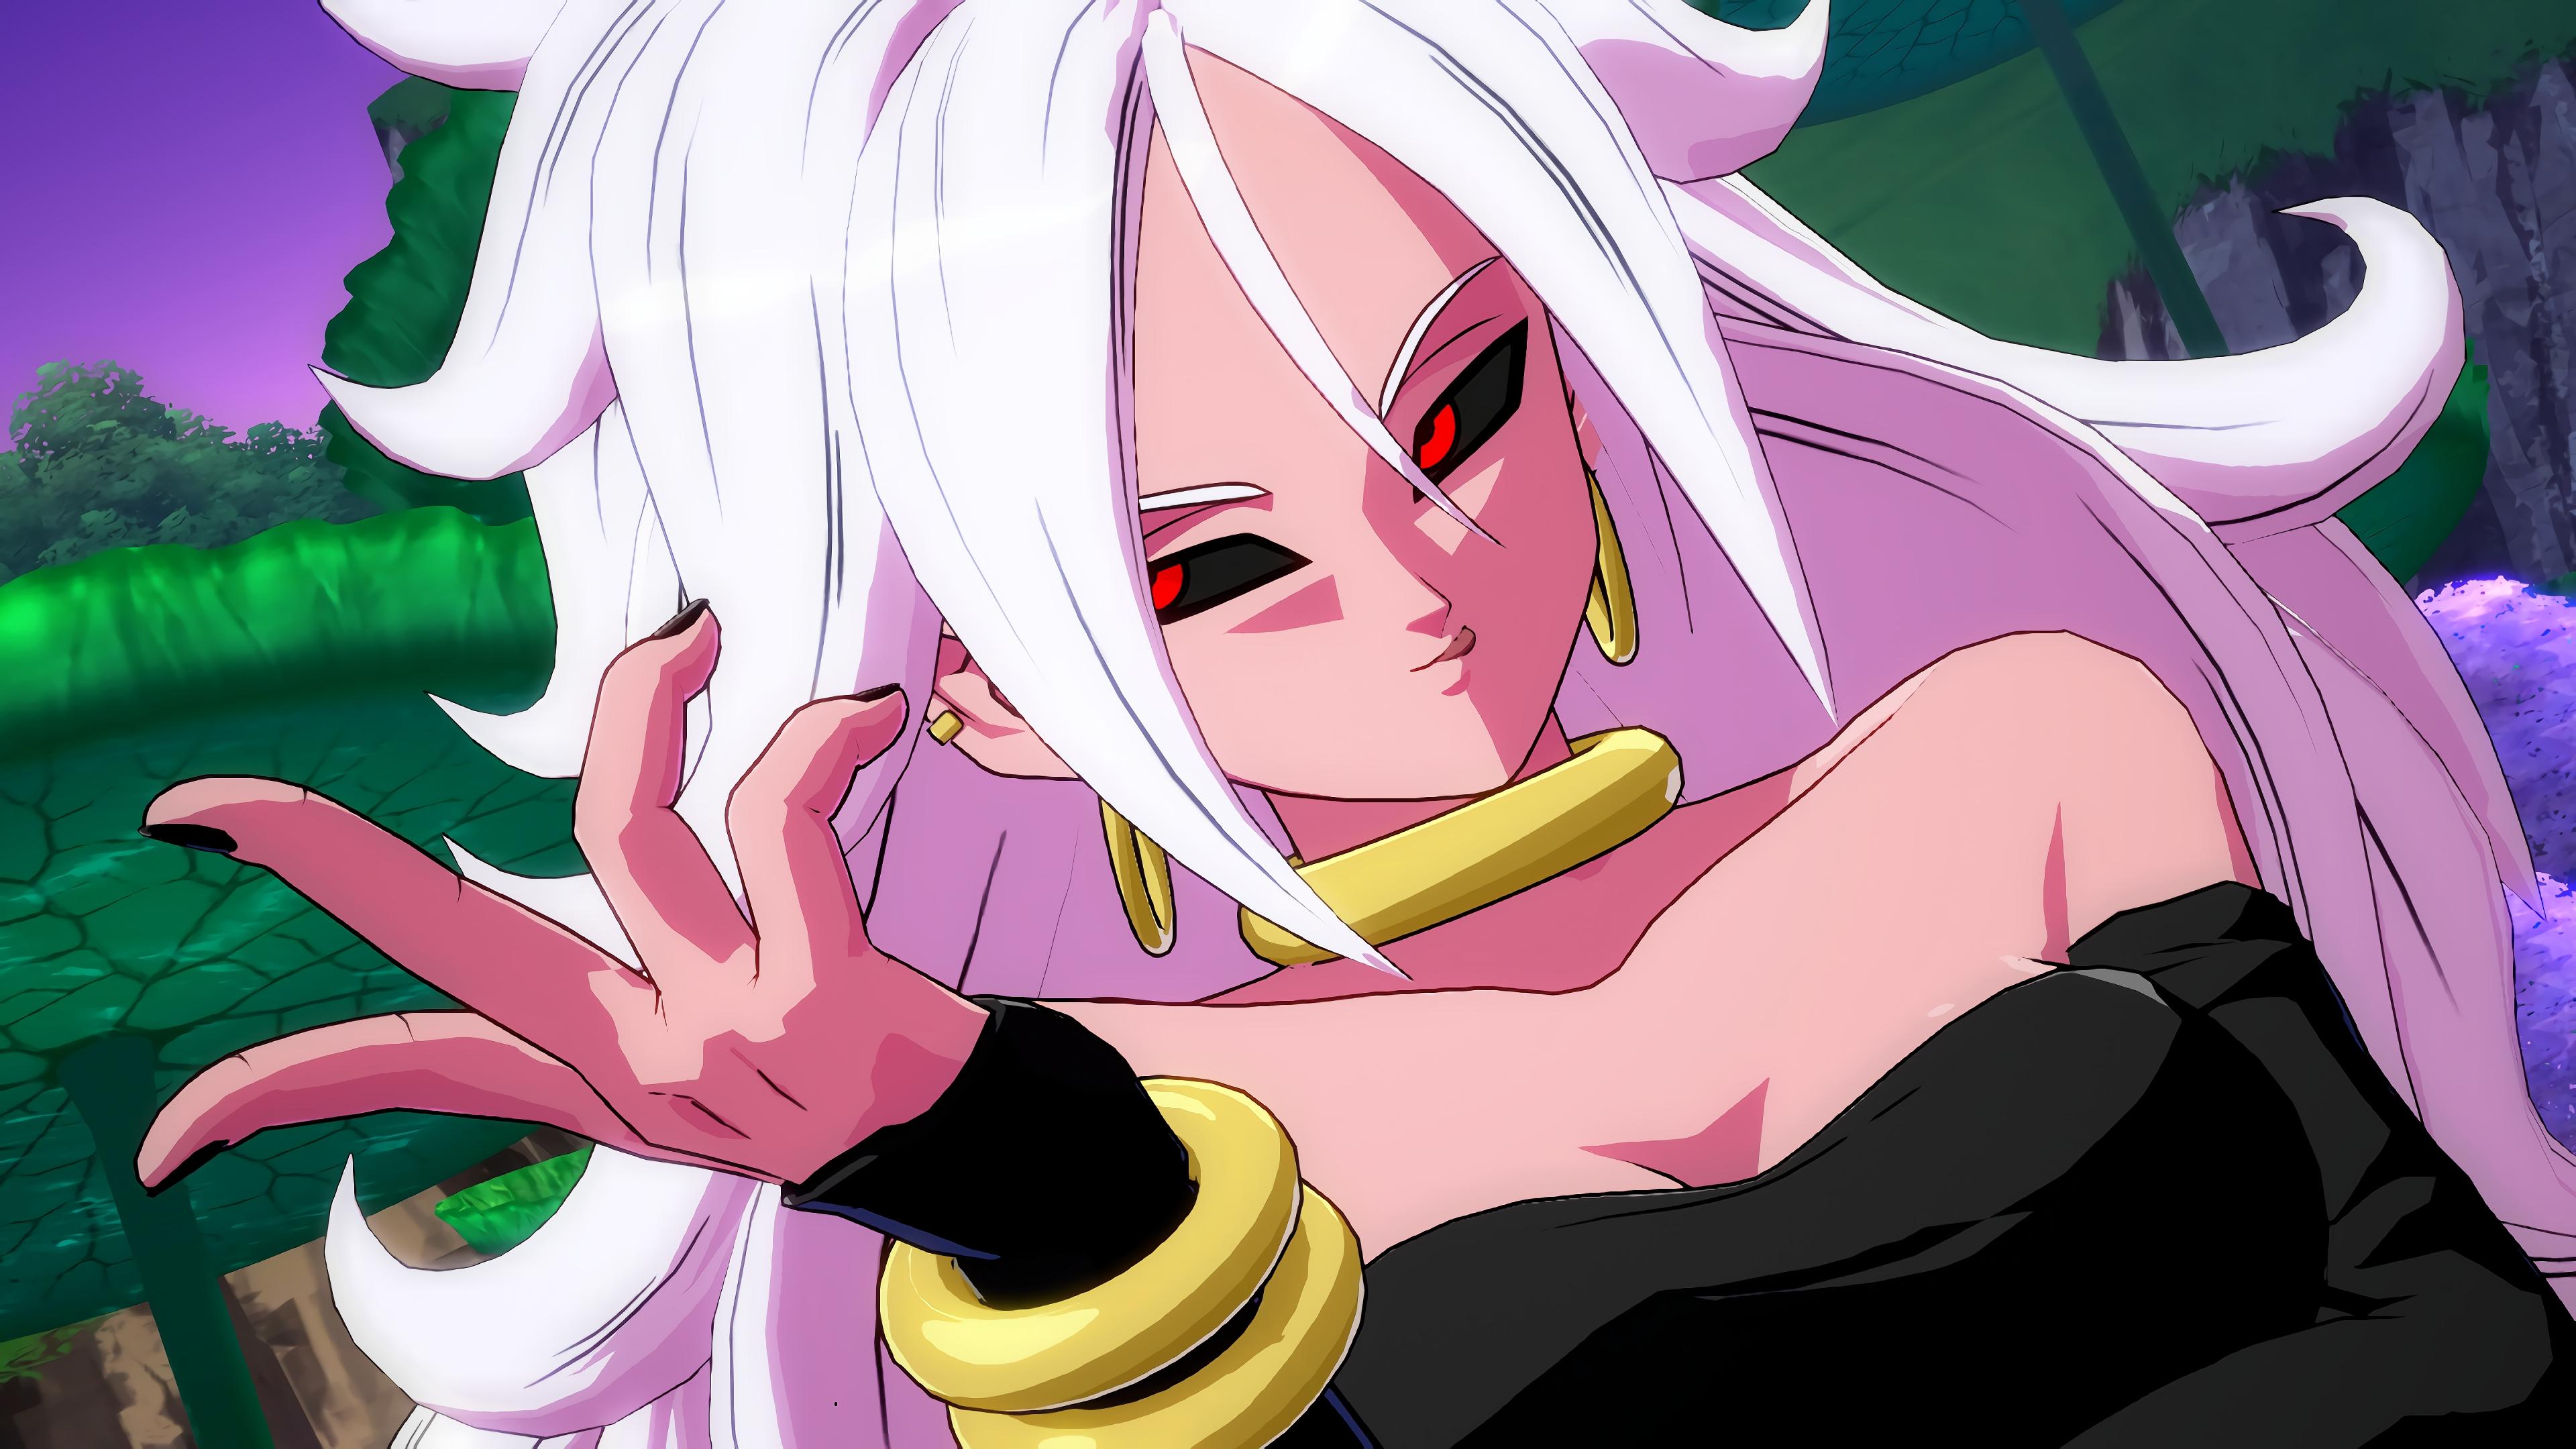 Majin Android 21 - Zerochan Anime Image Board